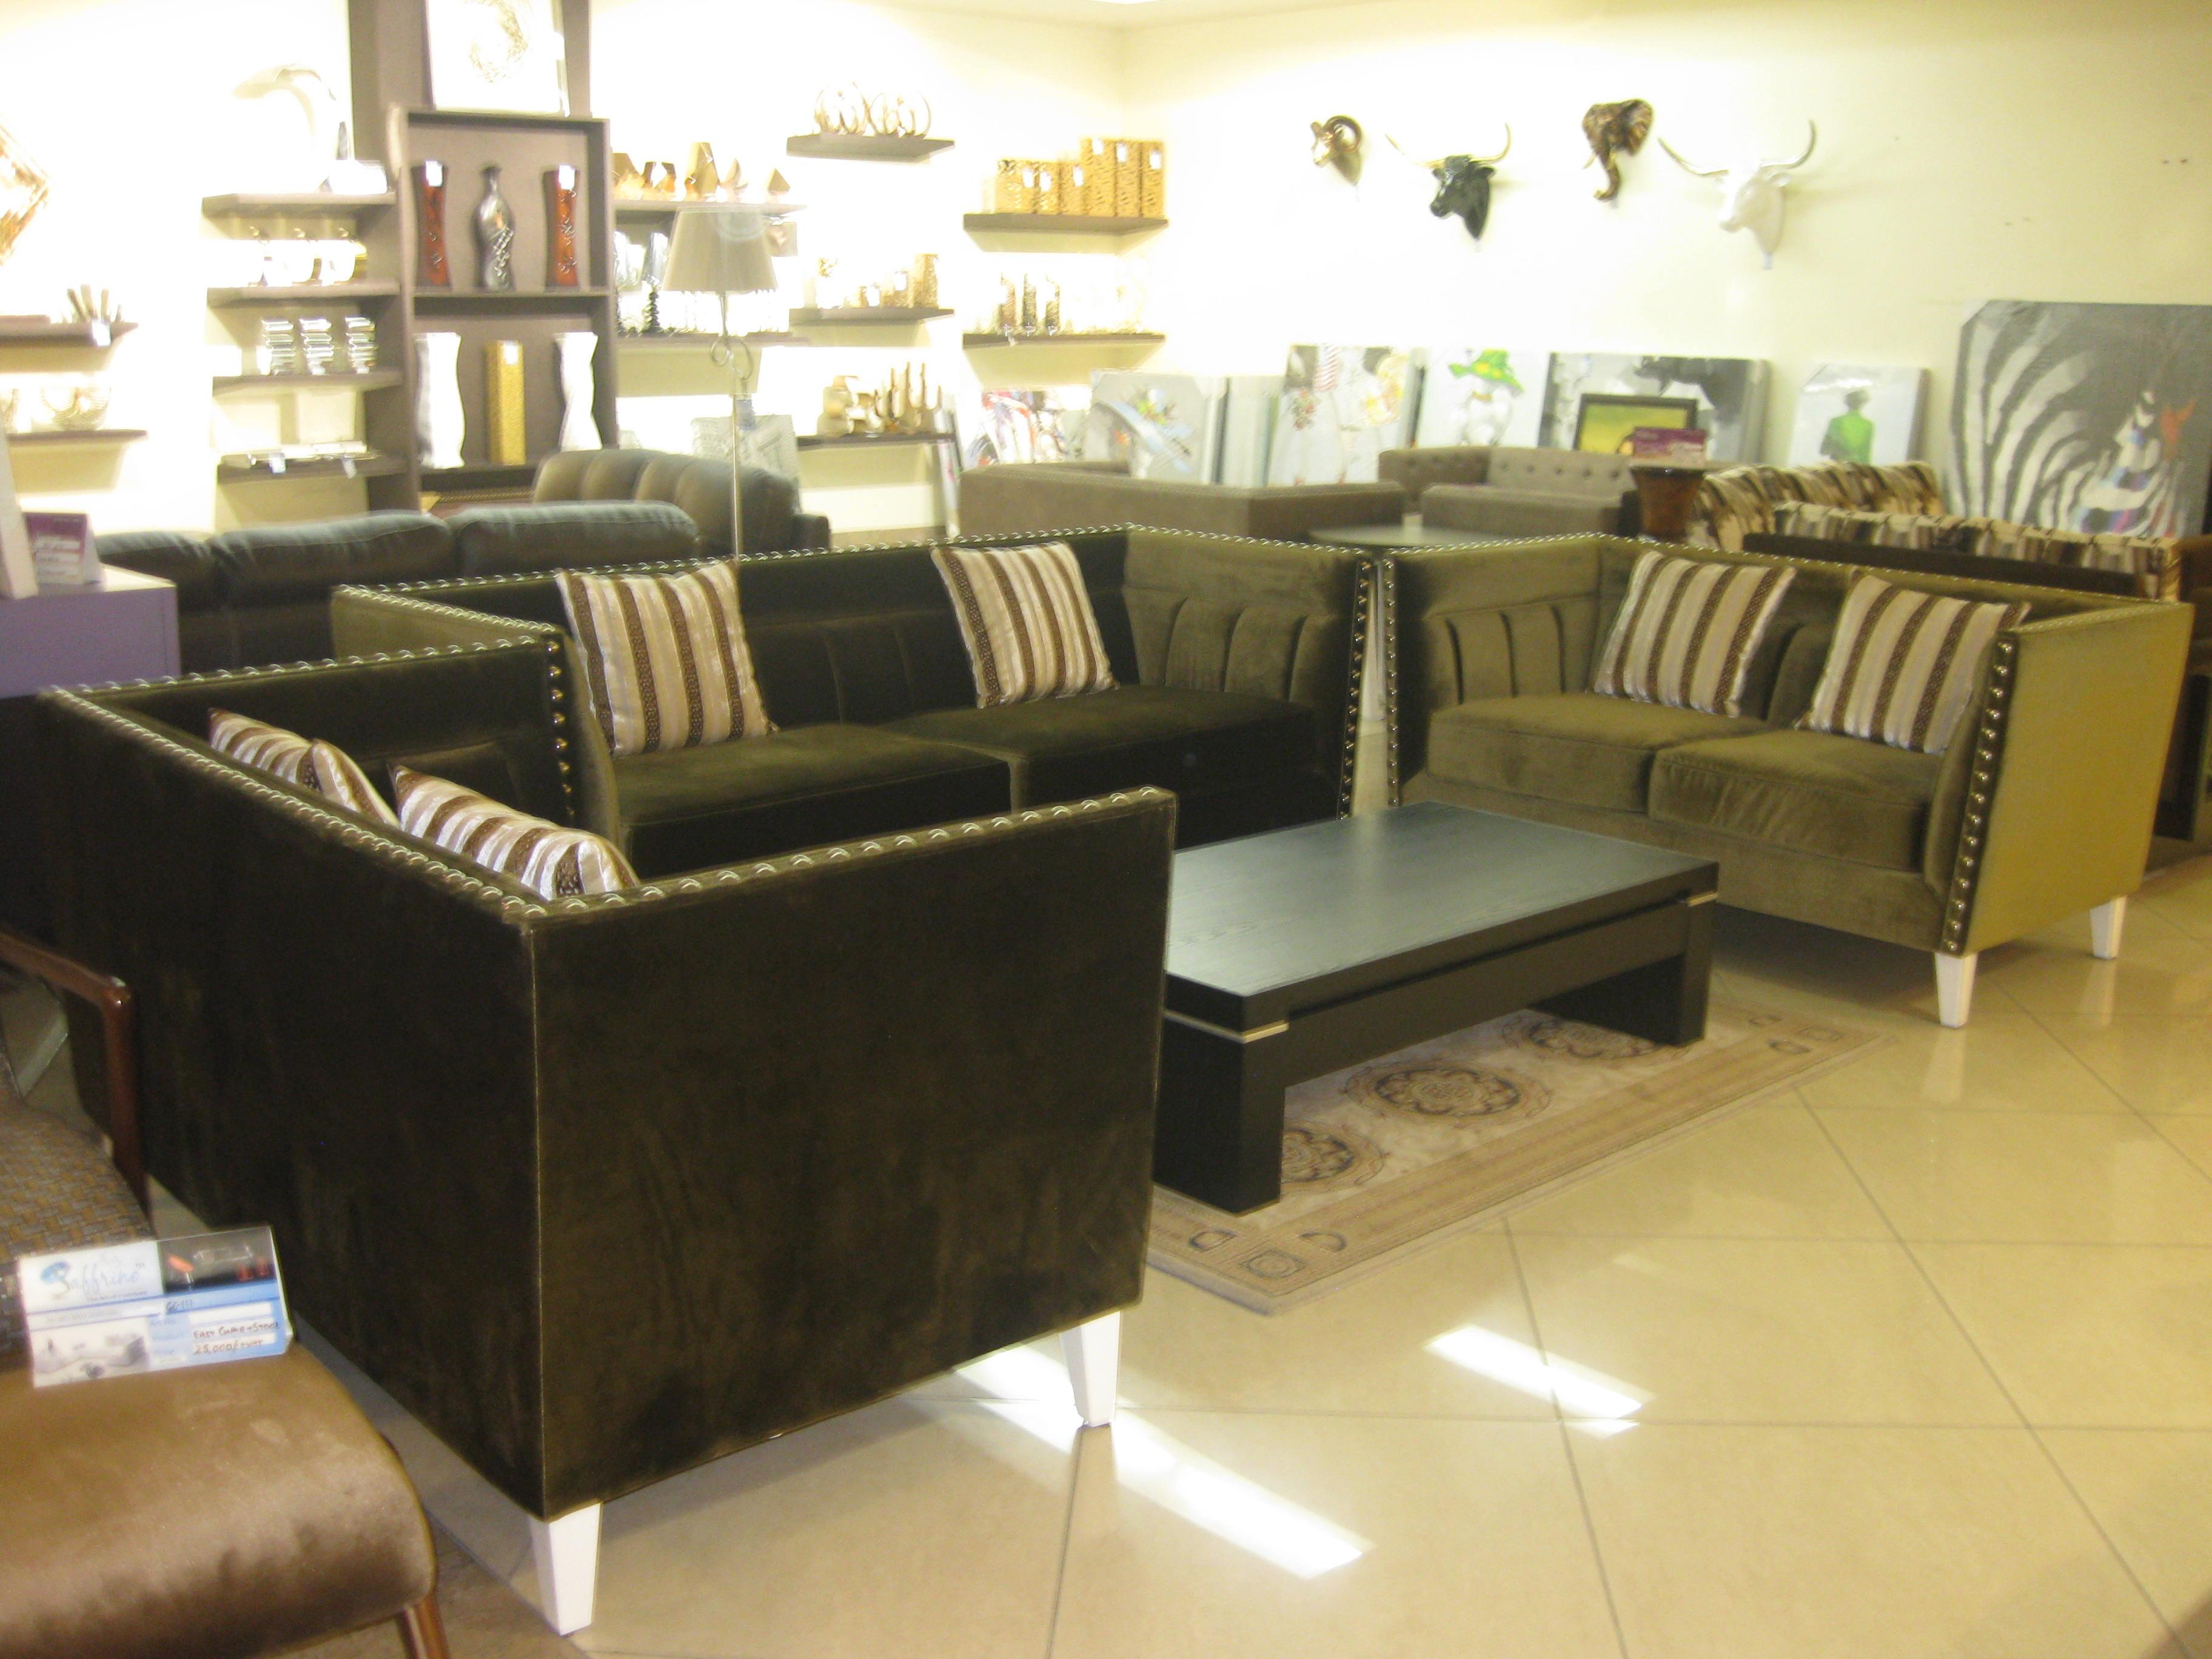 Saffrino the art of furniture showroom at jalandhar ludhiana